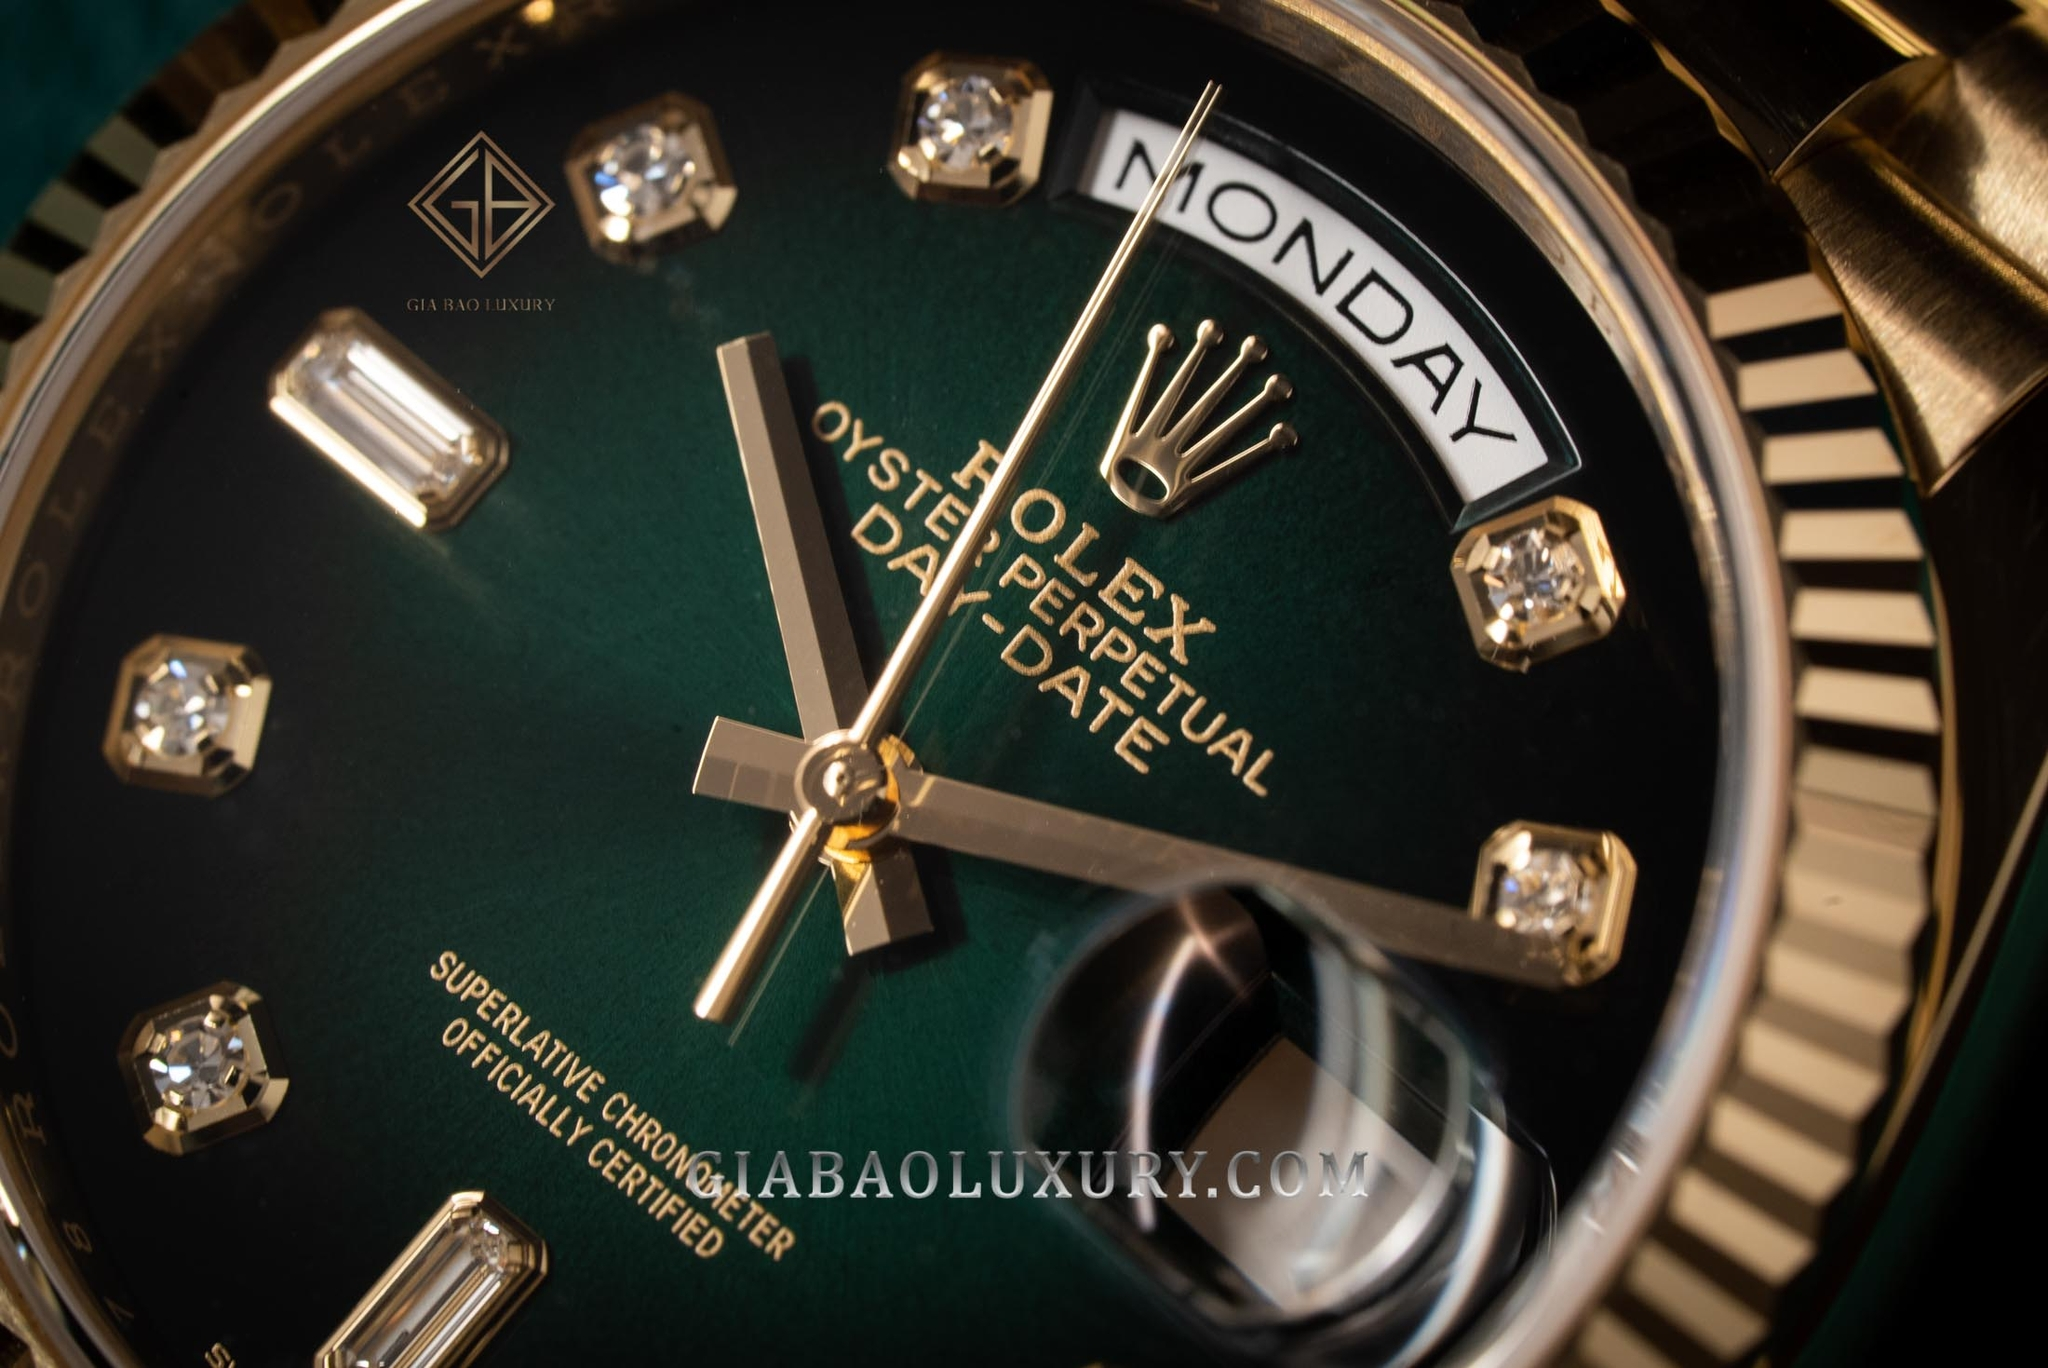 đồng hồ Rolex Day-Date 128238 ombré model mới 2019 tại Việt Nam